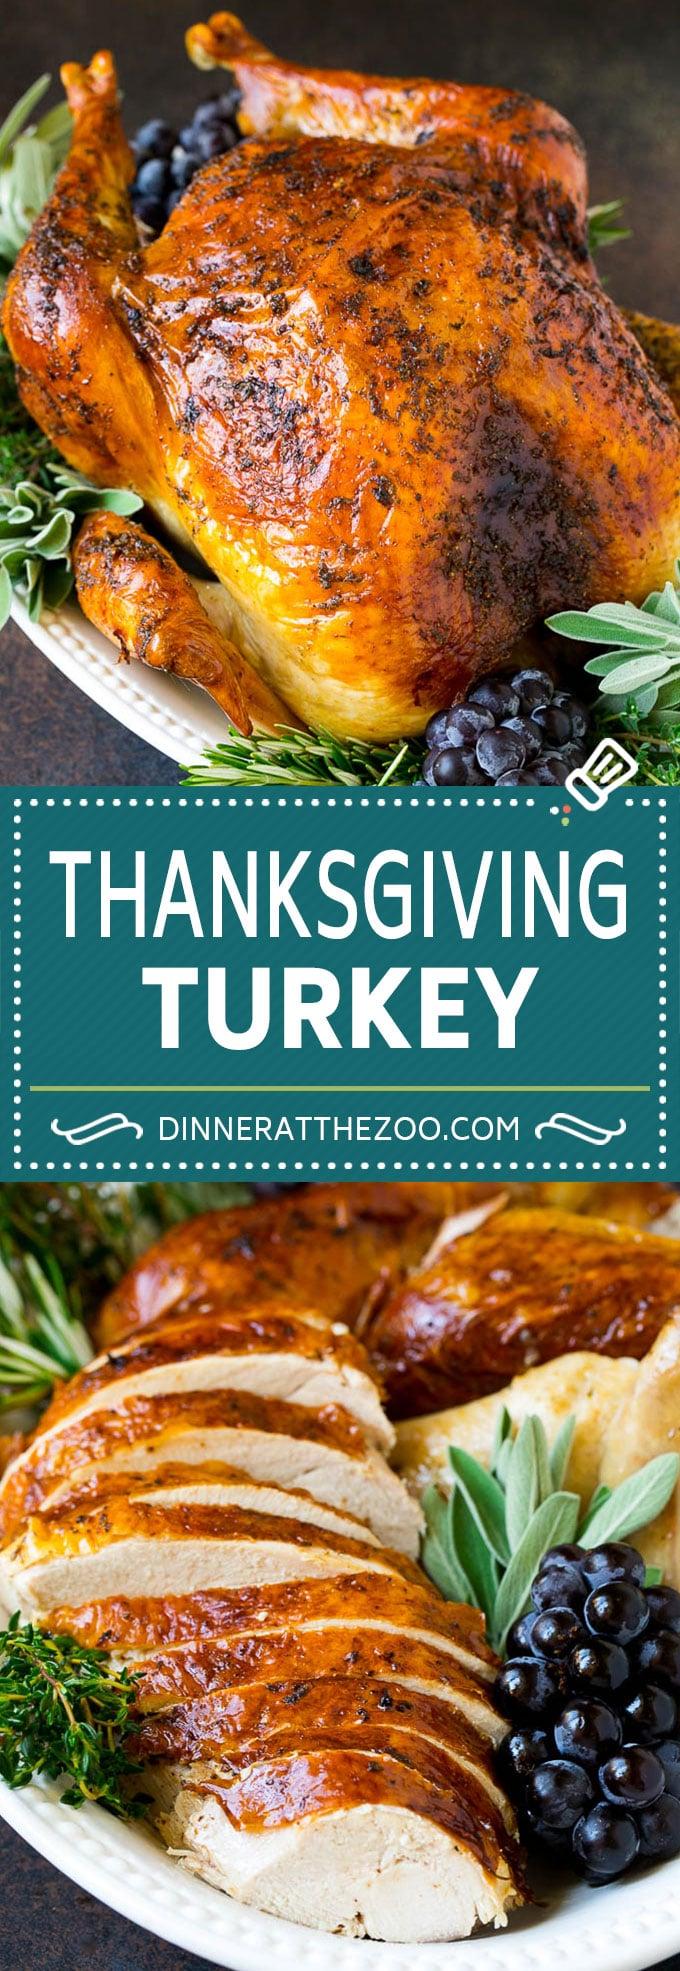 Thanksgiving Turkey Recipe | Roasted Turkey #turkey #thanksgiving #fall #dinner #dinneratthezoo